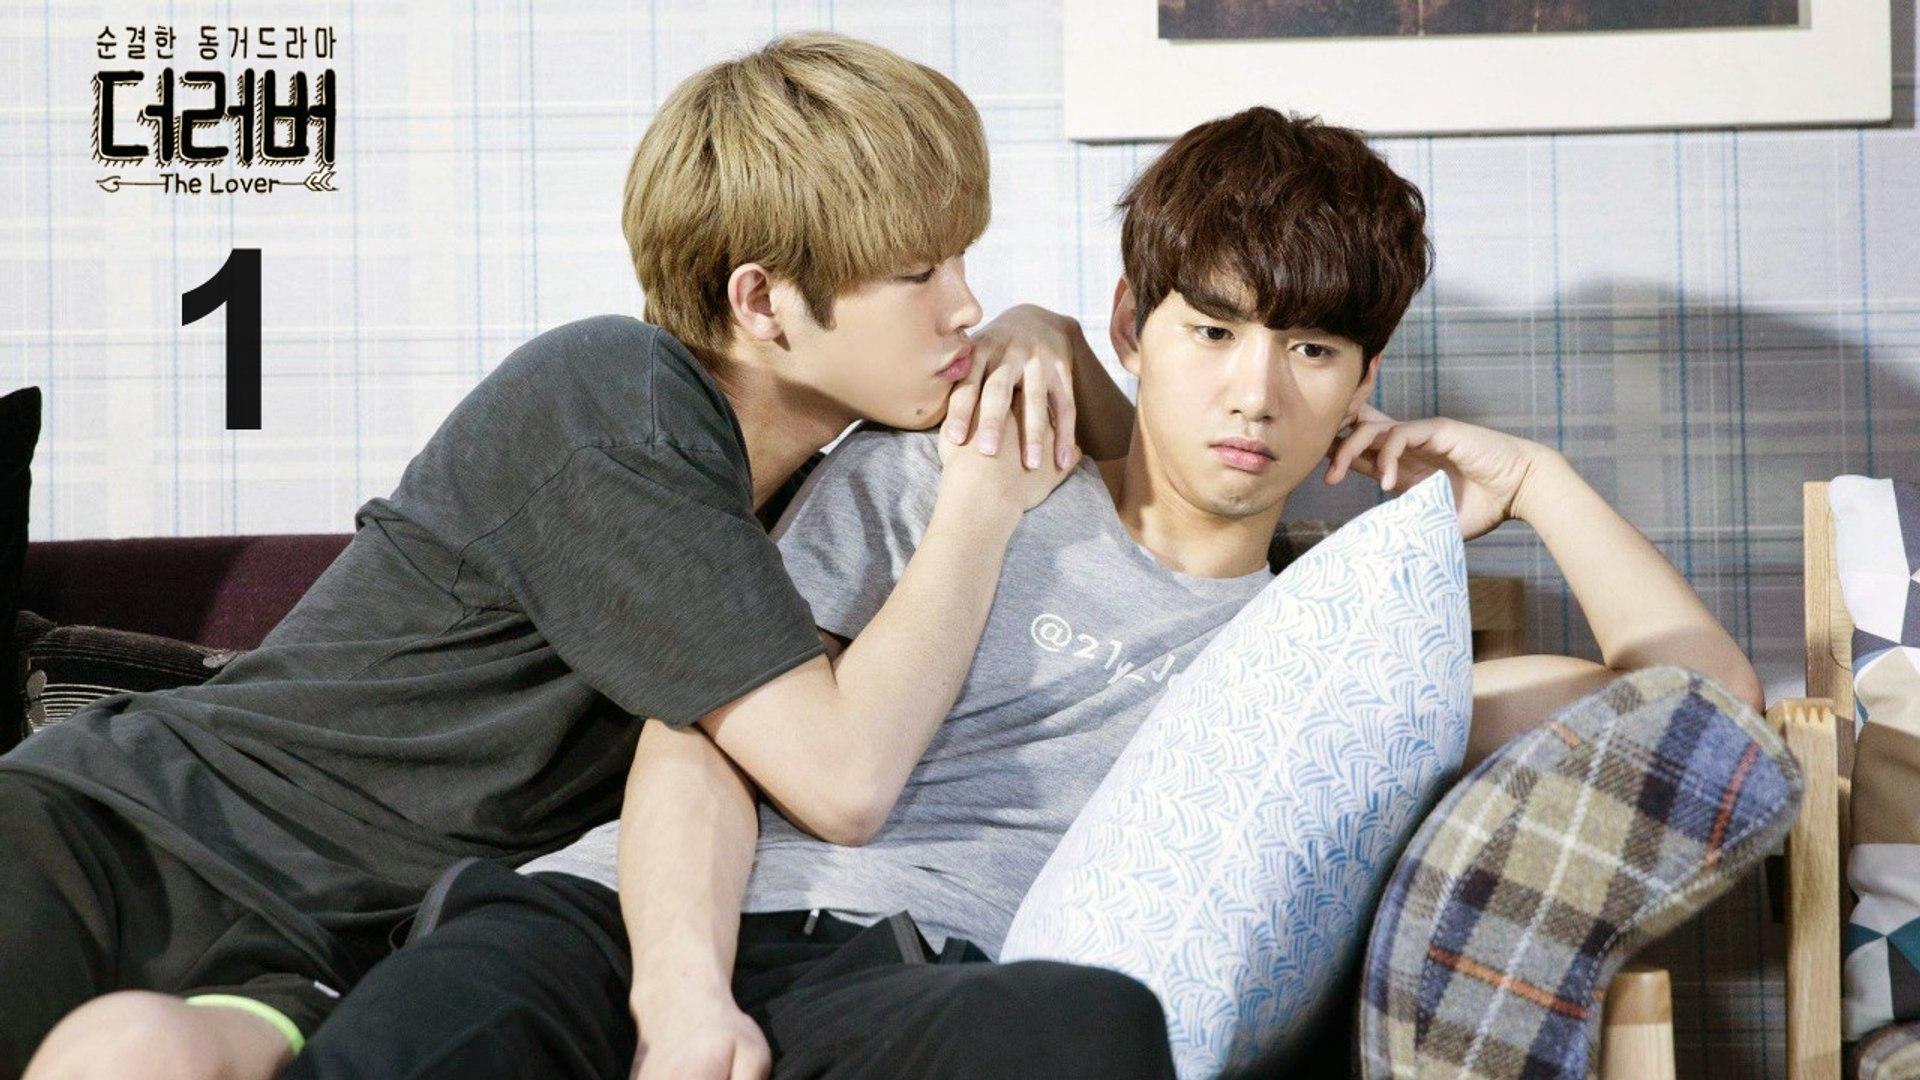 [Eng Sub] 더 러버 The Lover (Part 1/3) | Takuya ♡ Joon Jae